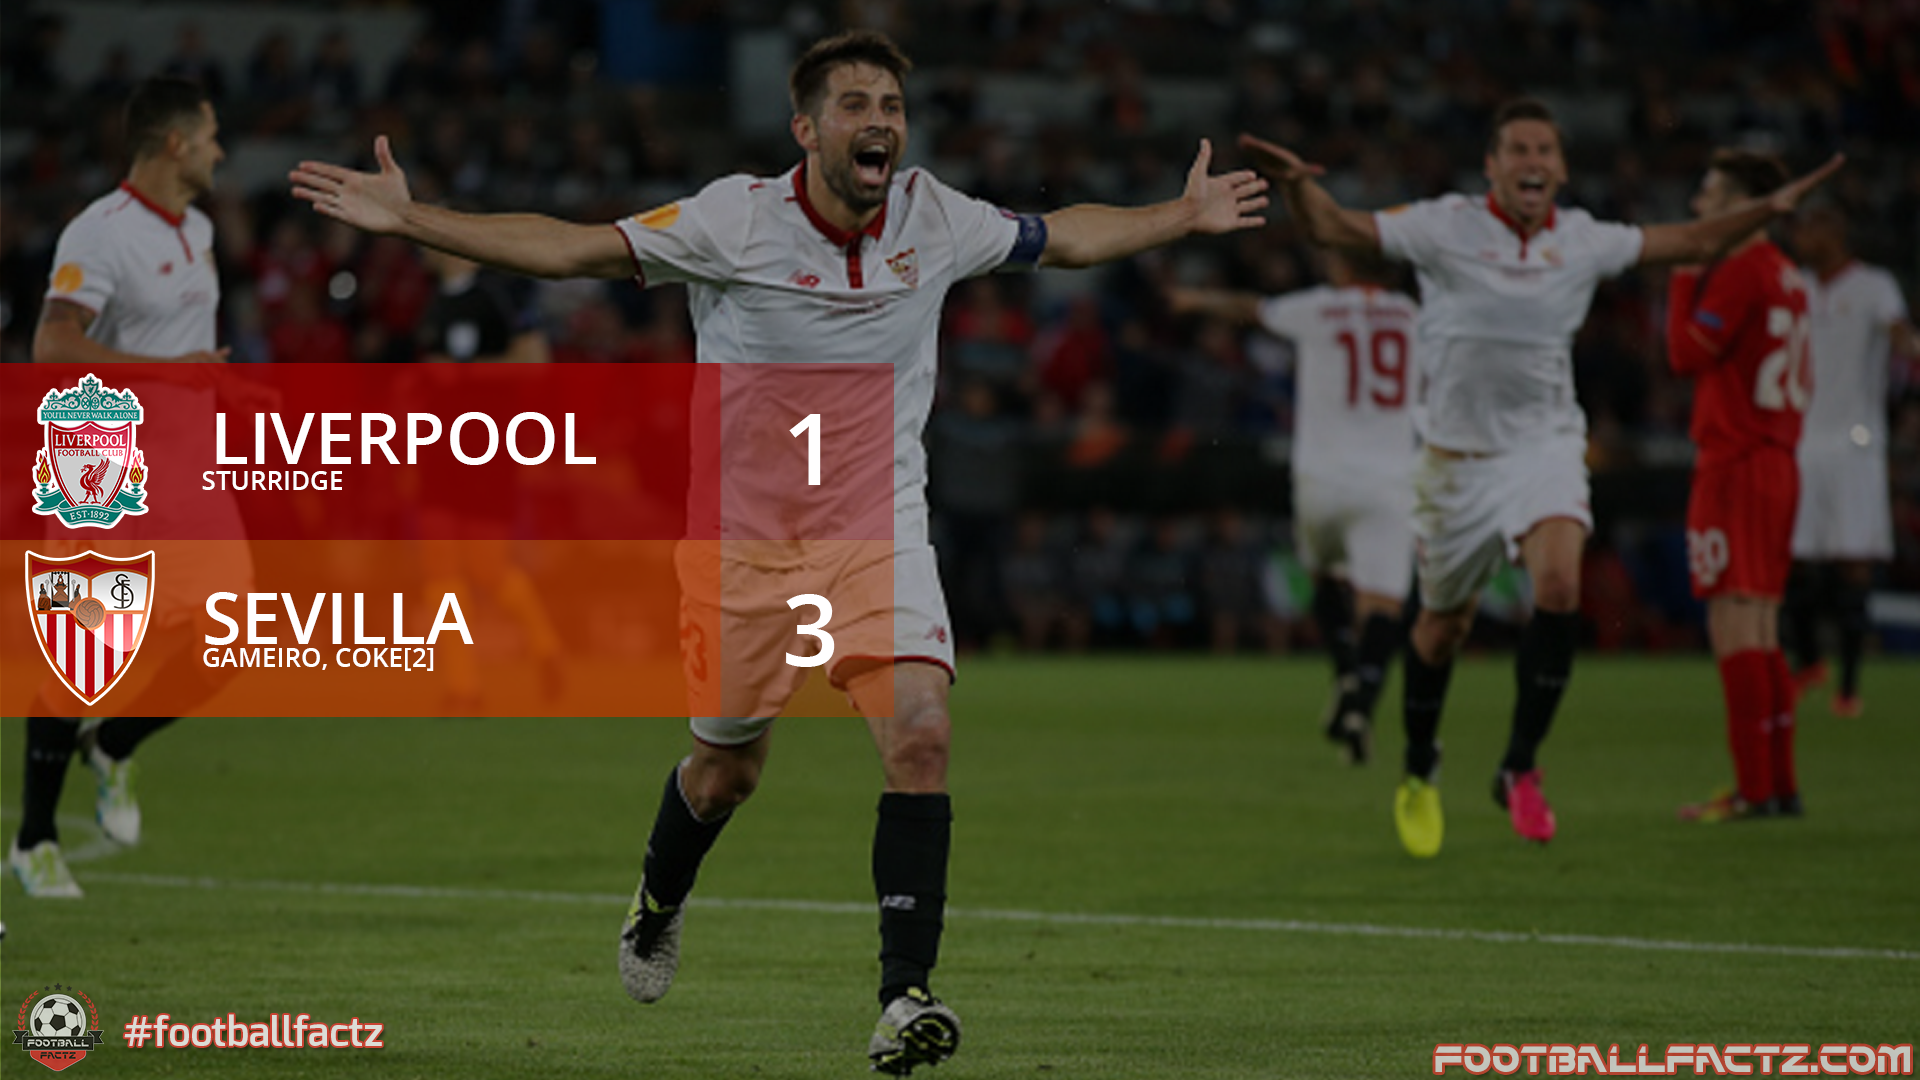 Liverpool 1 - 3 Sevilla, Europa League Final 2016